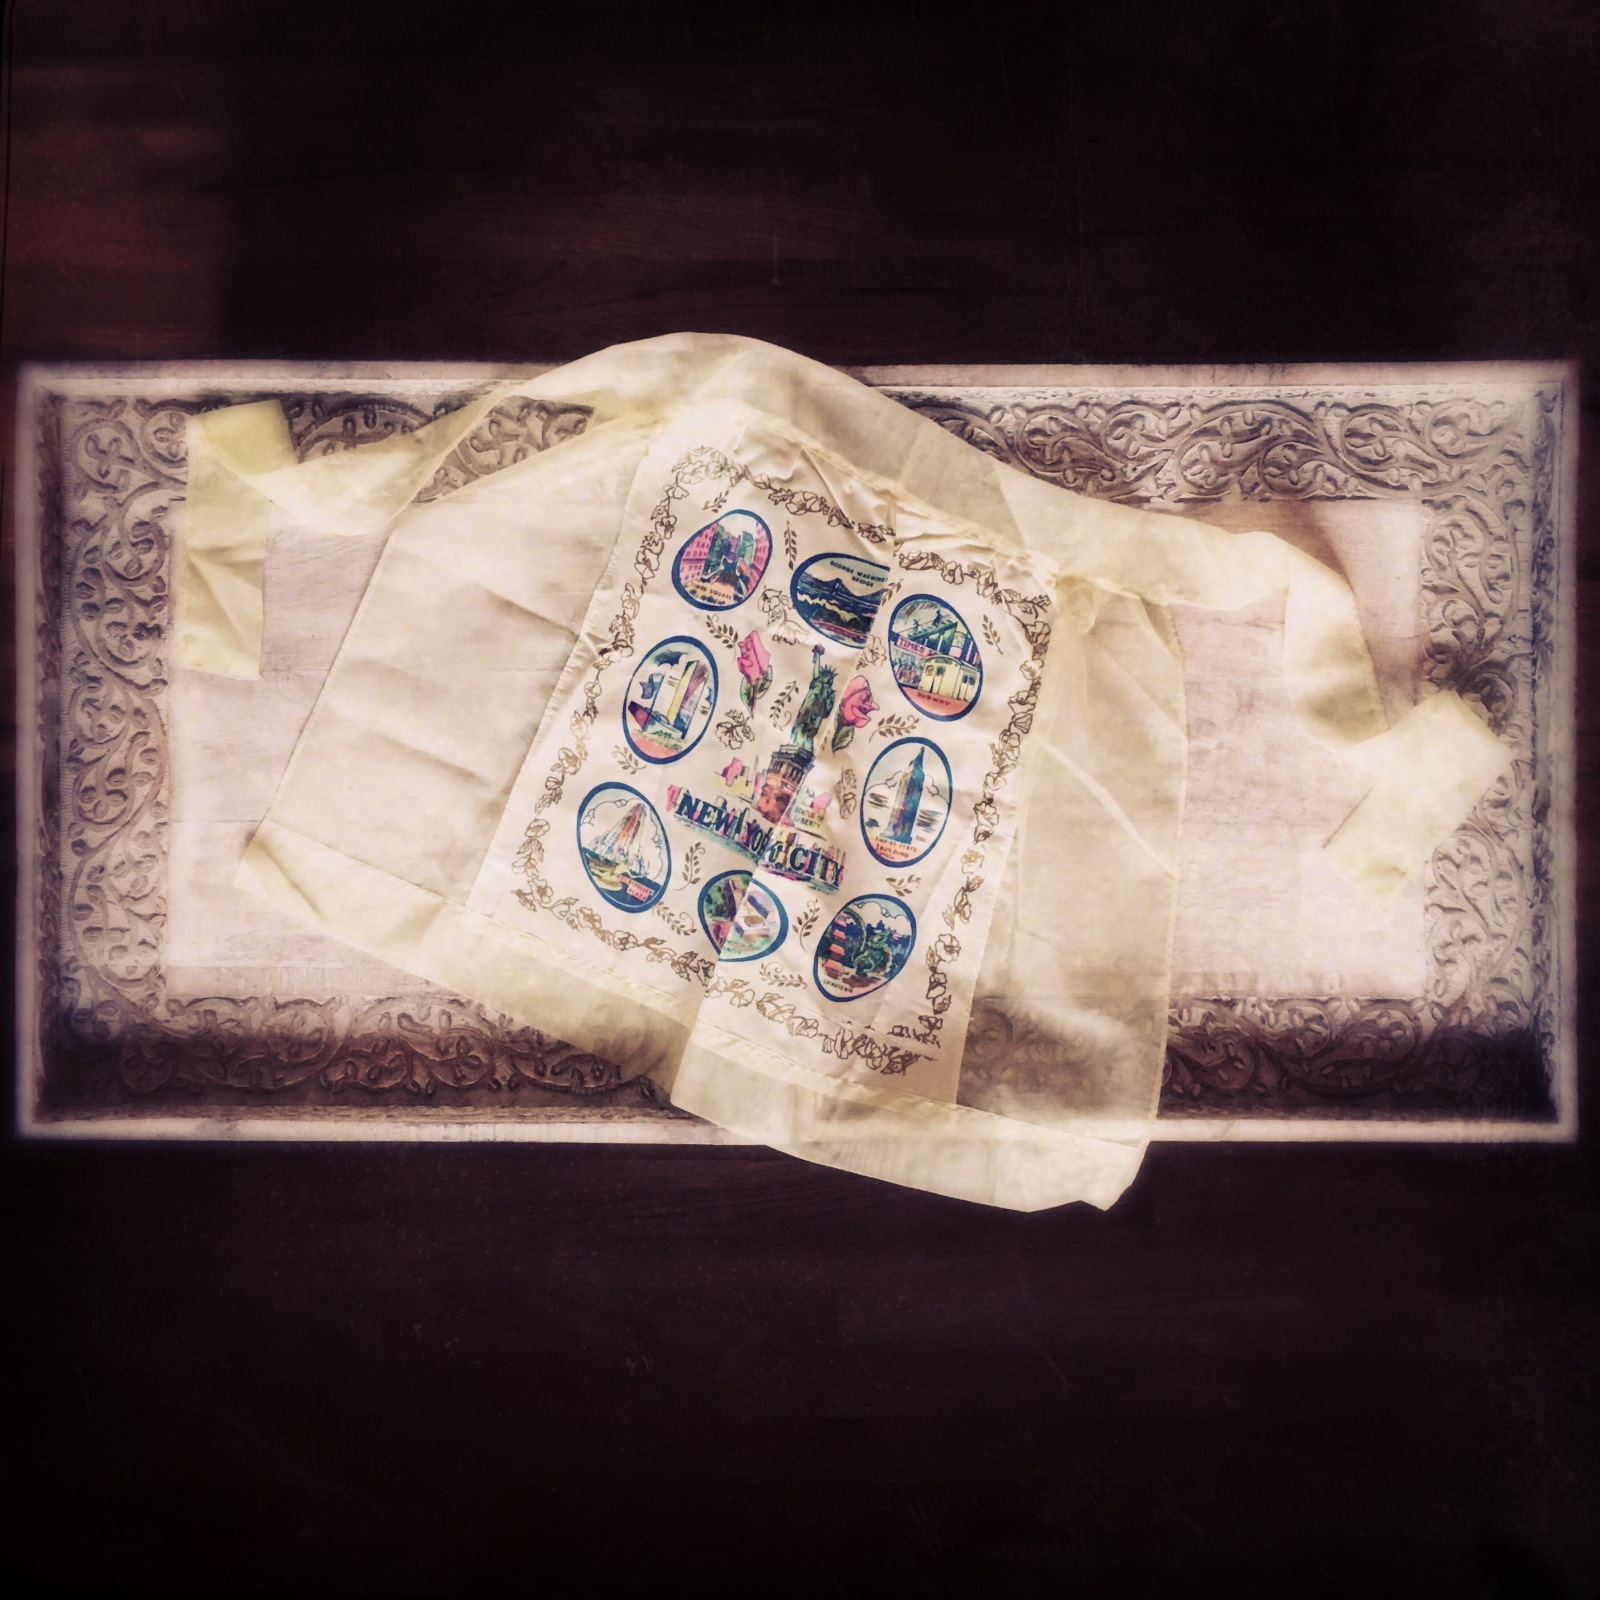 vintage apron 1964. photograph ©2017 Lucy Mathews Heegaard.